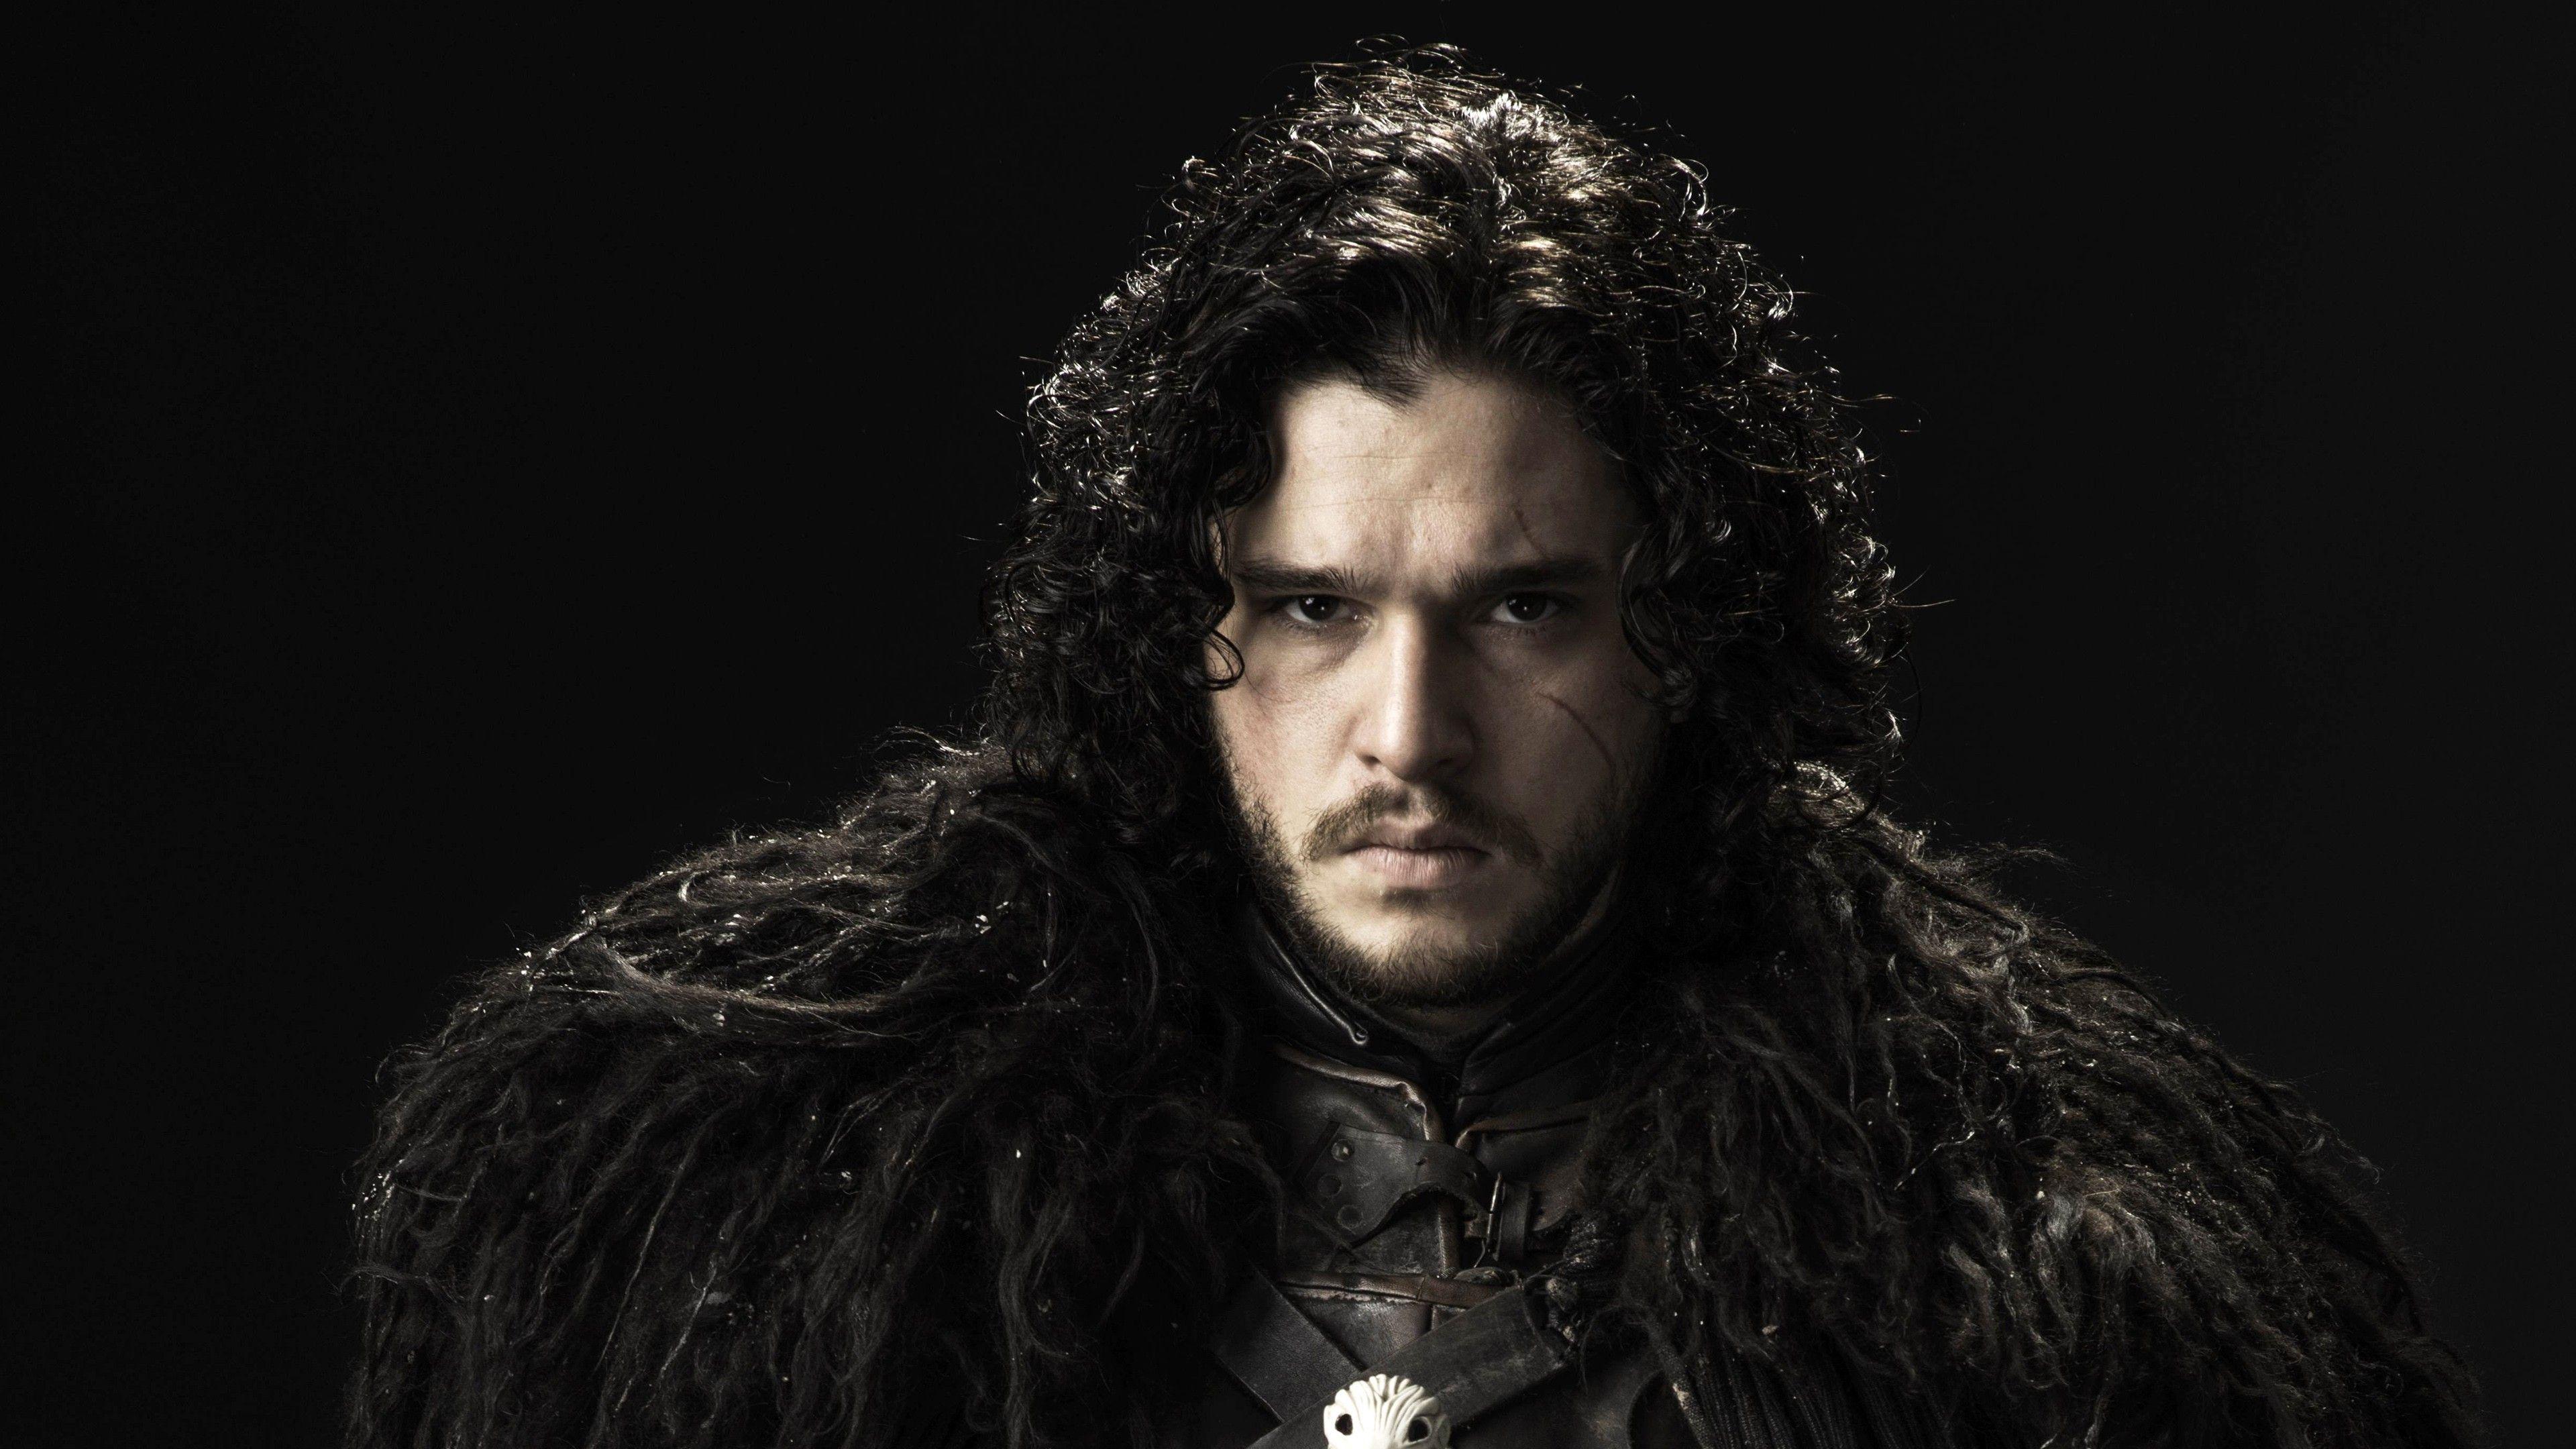 Game Of Thrones Season 7 Jon Snow Wallpaper 4k 2021 Live Wallpaper Hd Snow Wallpaper Hd Game Of Thrones Dragons Gaming Wallpapers Hd